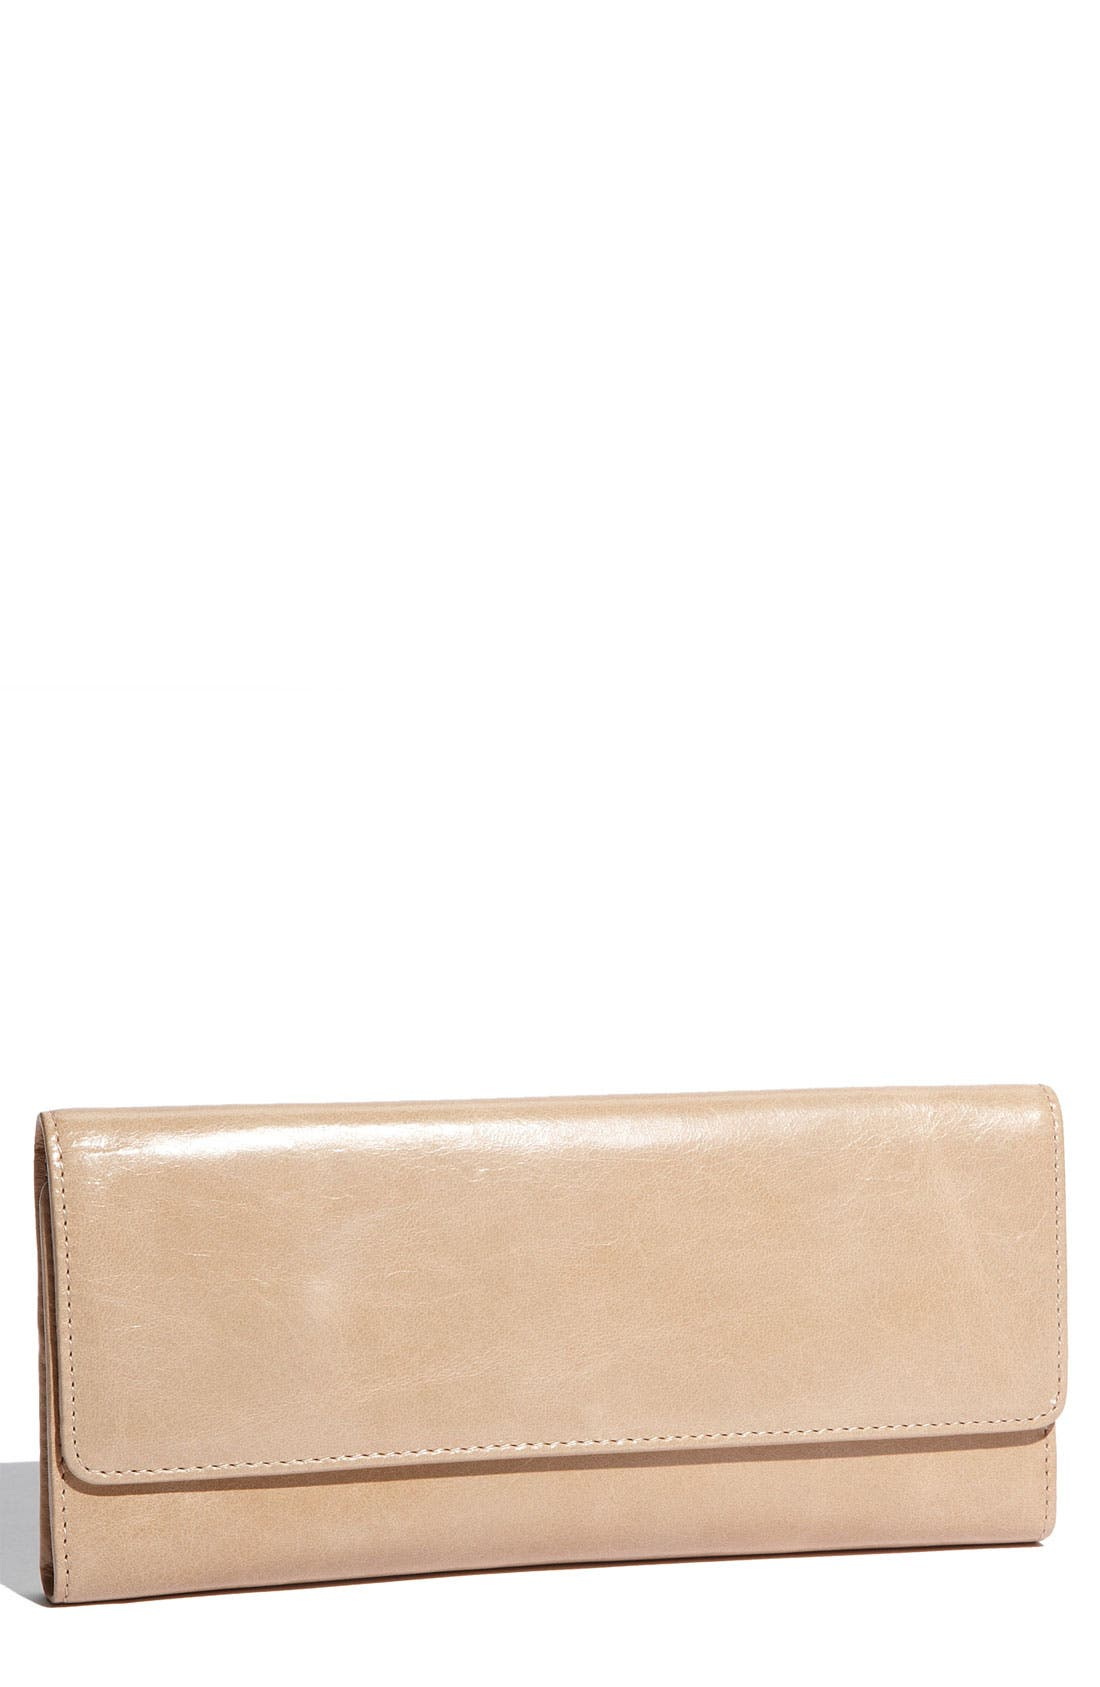 'Sadie' Leather Wallet,                             Main thumbnail 32, color,